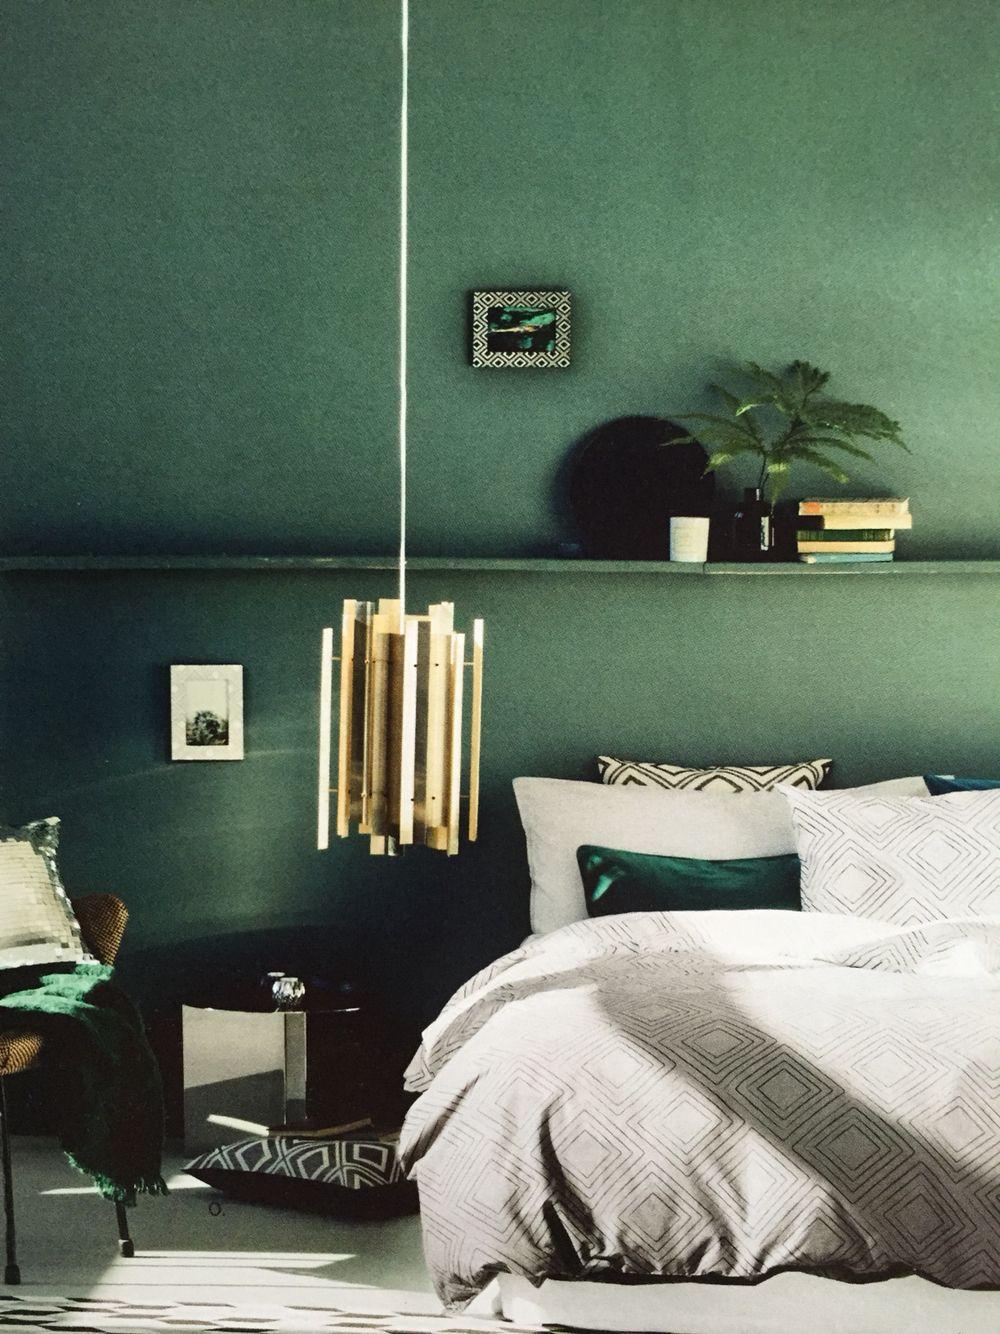 Zimmerfarbe stil dunkelgrün petrol wandfarbe  color  pinterest  bedroom bedroom